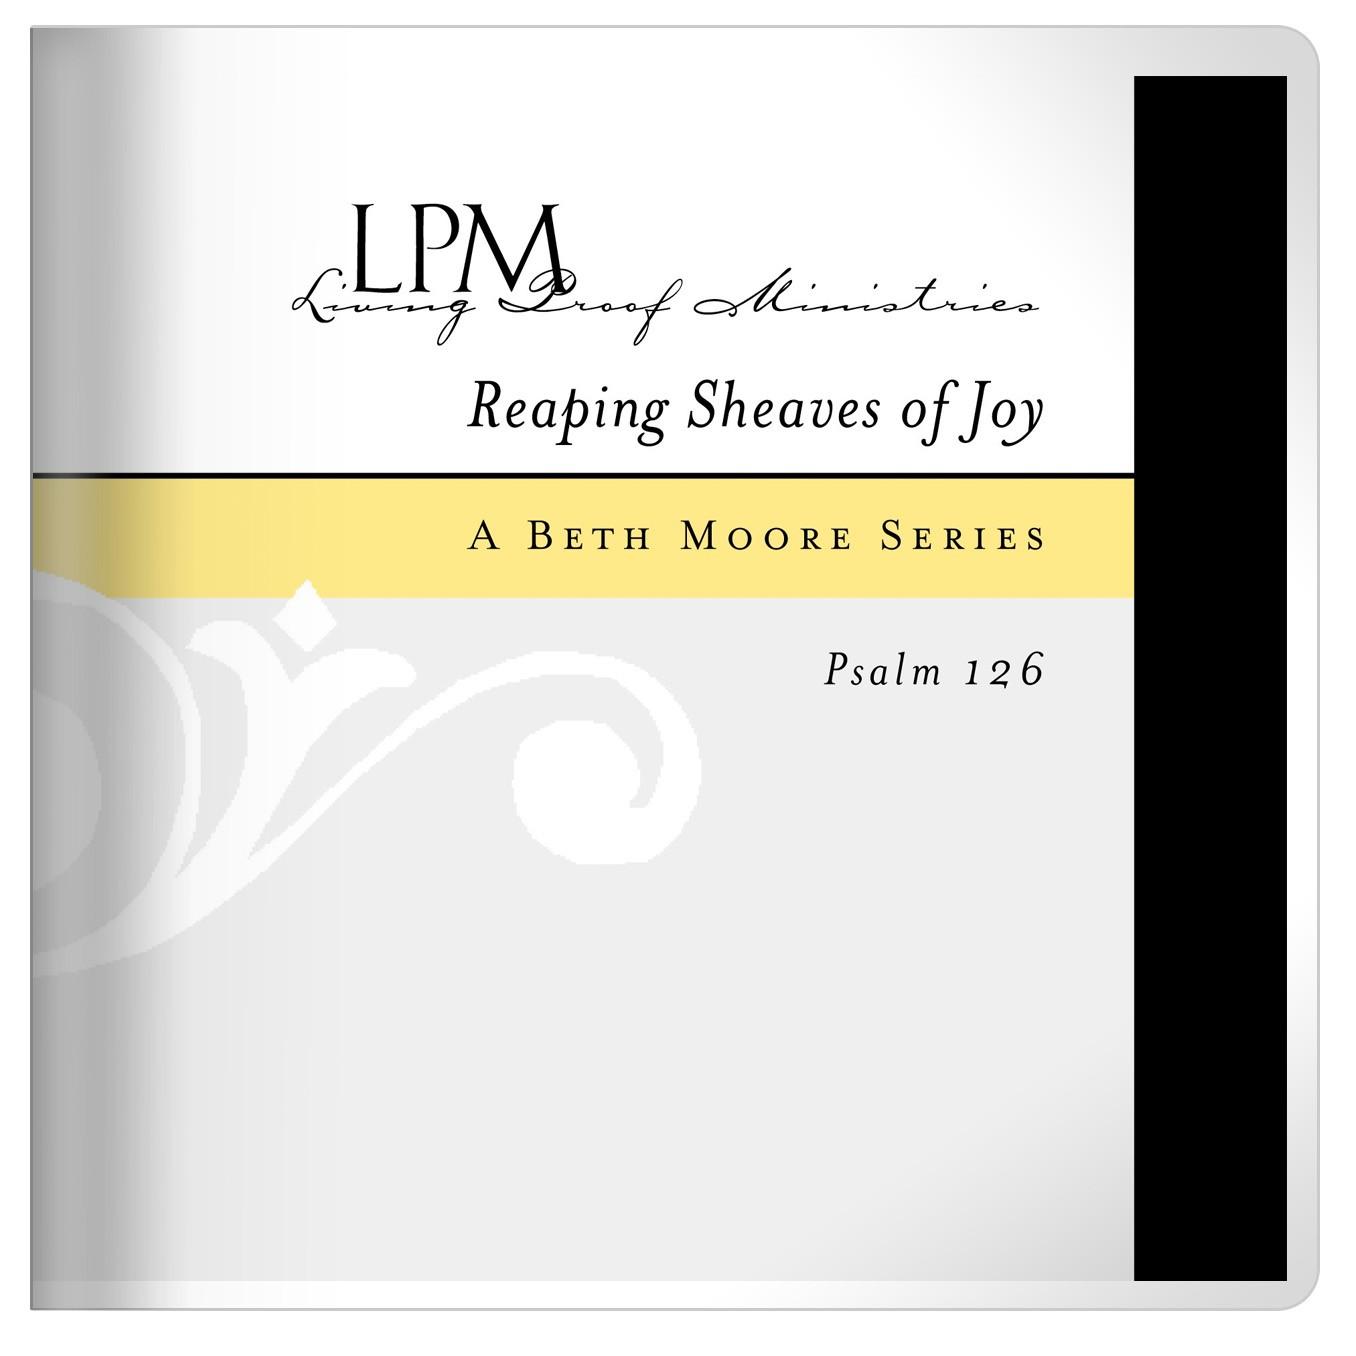 Reaping Sheaves of Joy